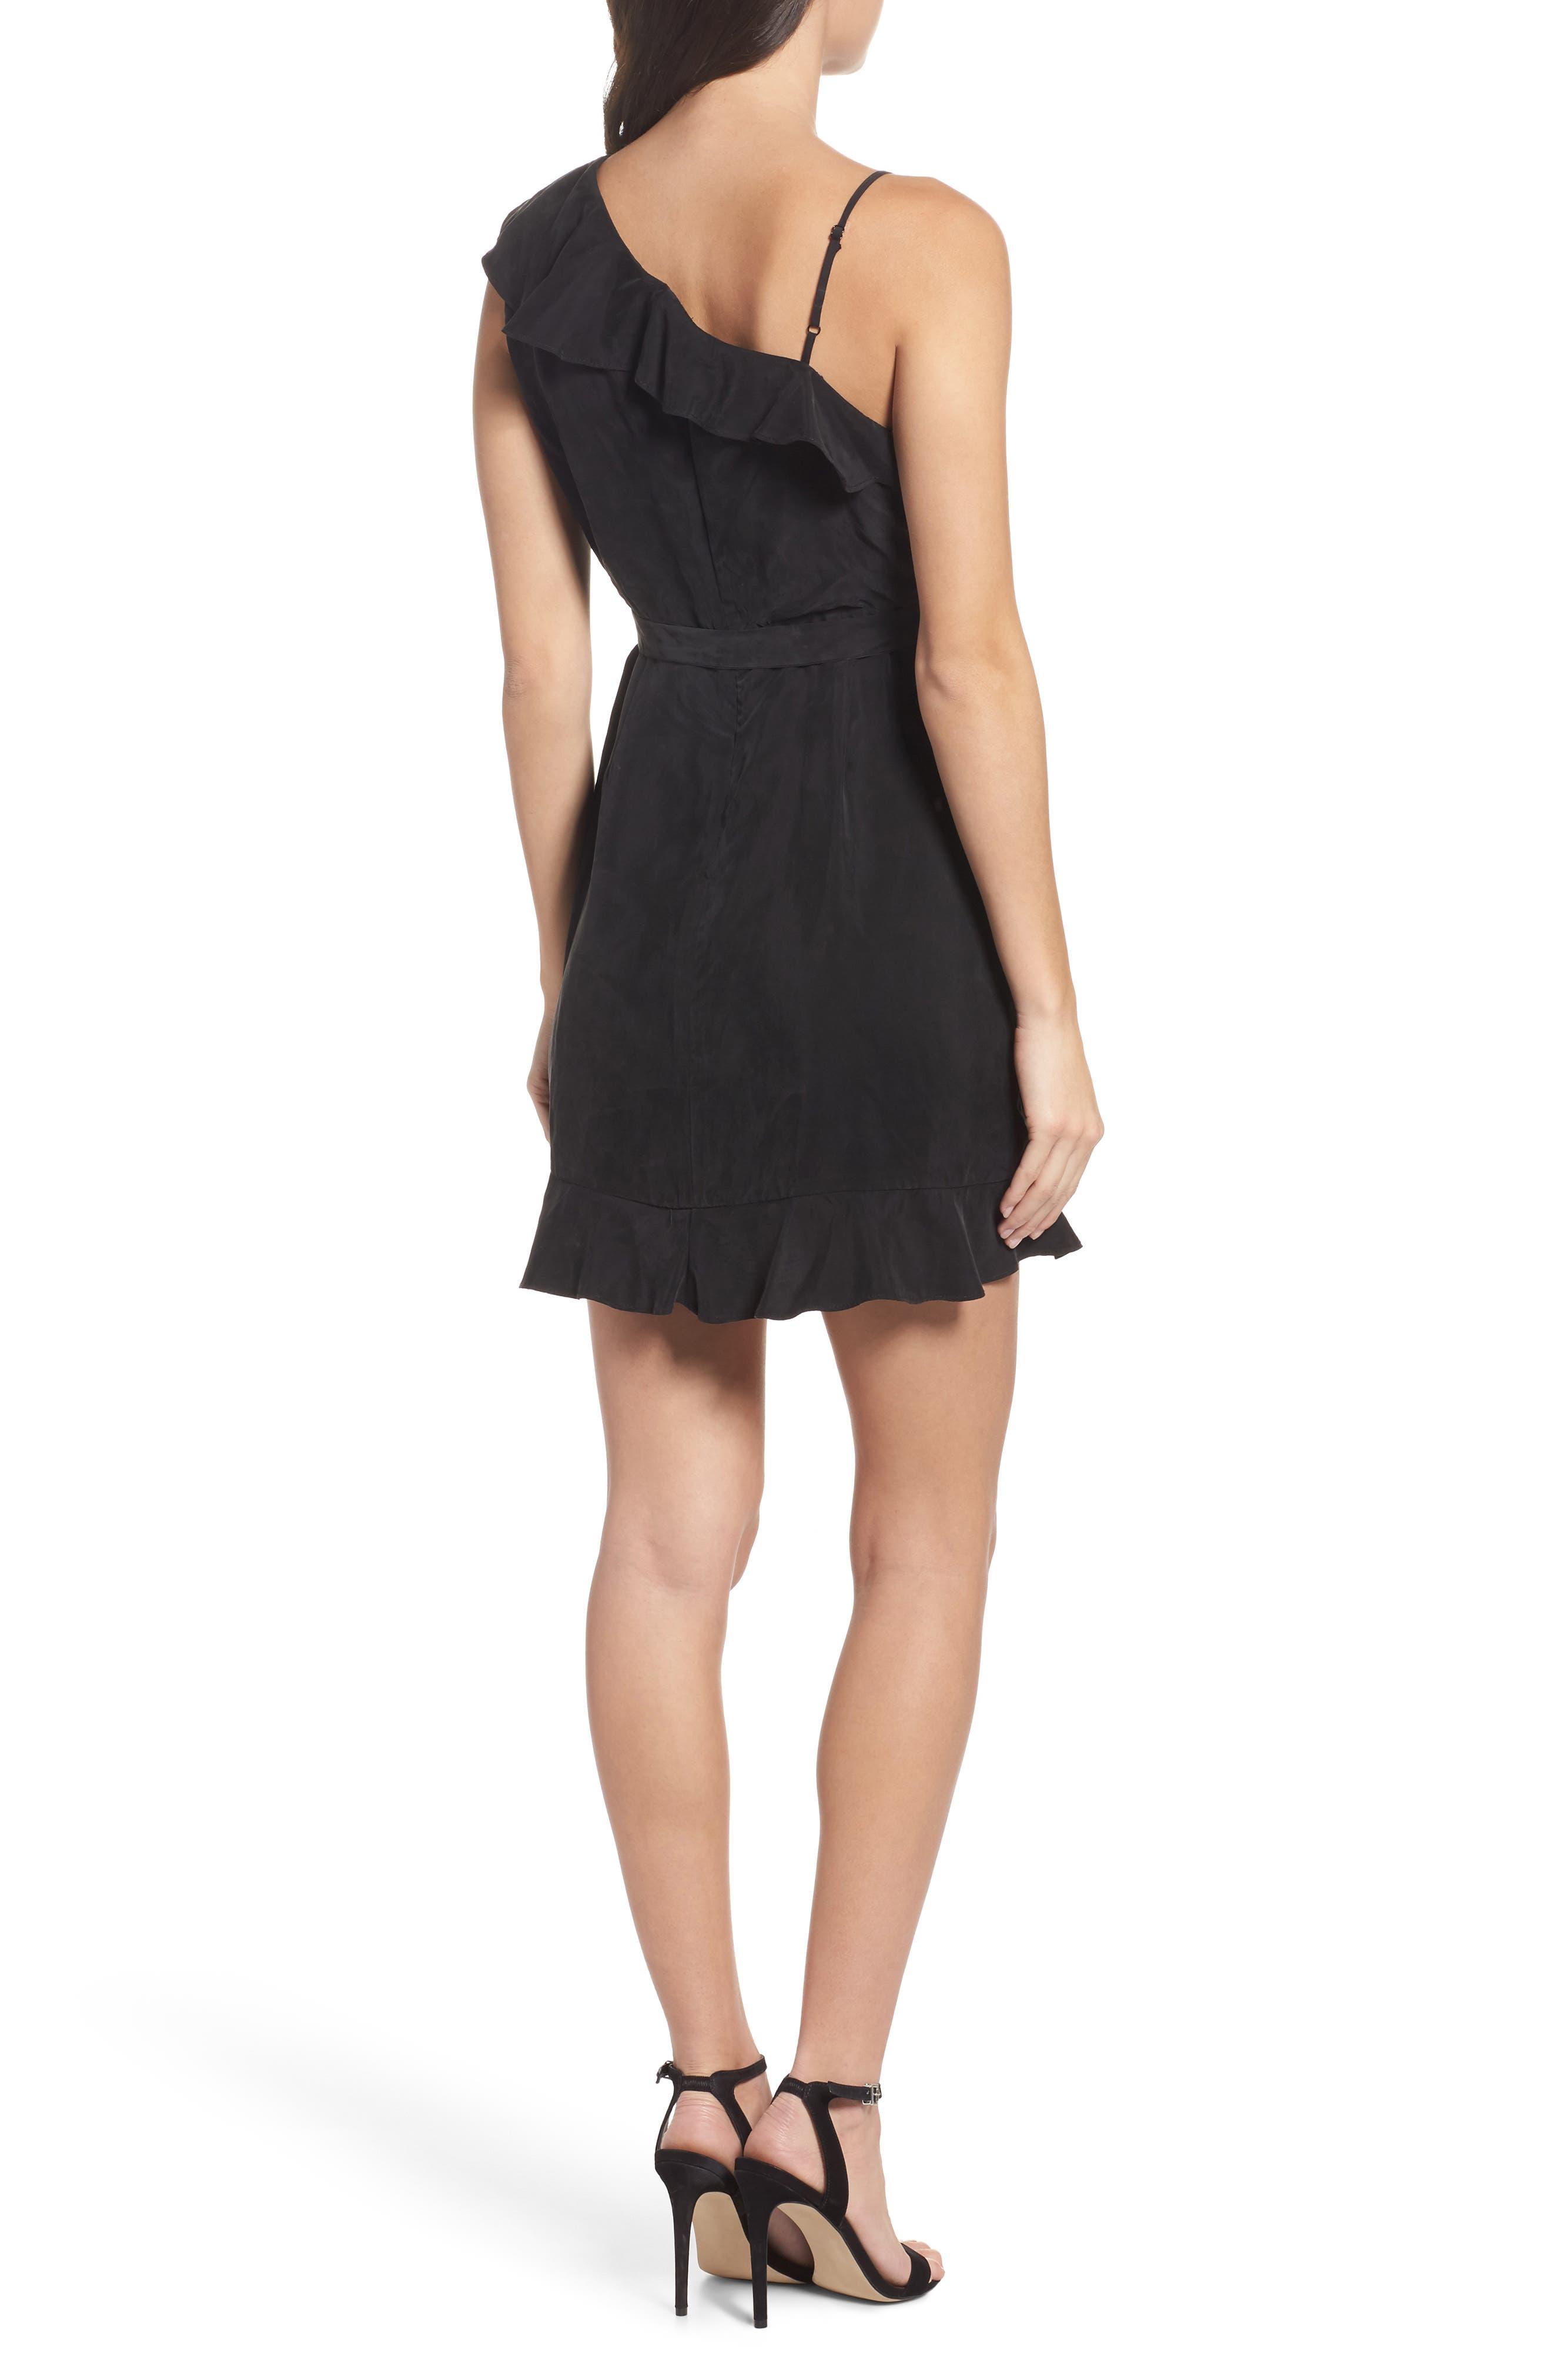 Milly One-Shoulder Wrap Dress,                             Alternate thumbnail 2, color,                             Black